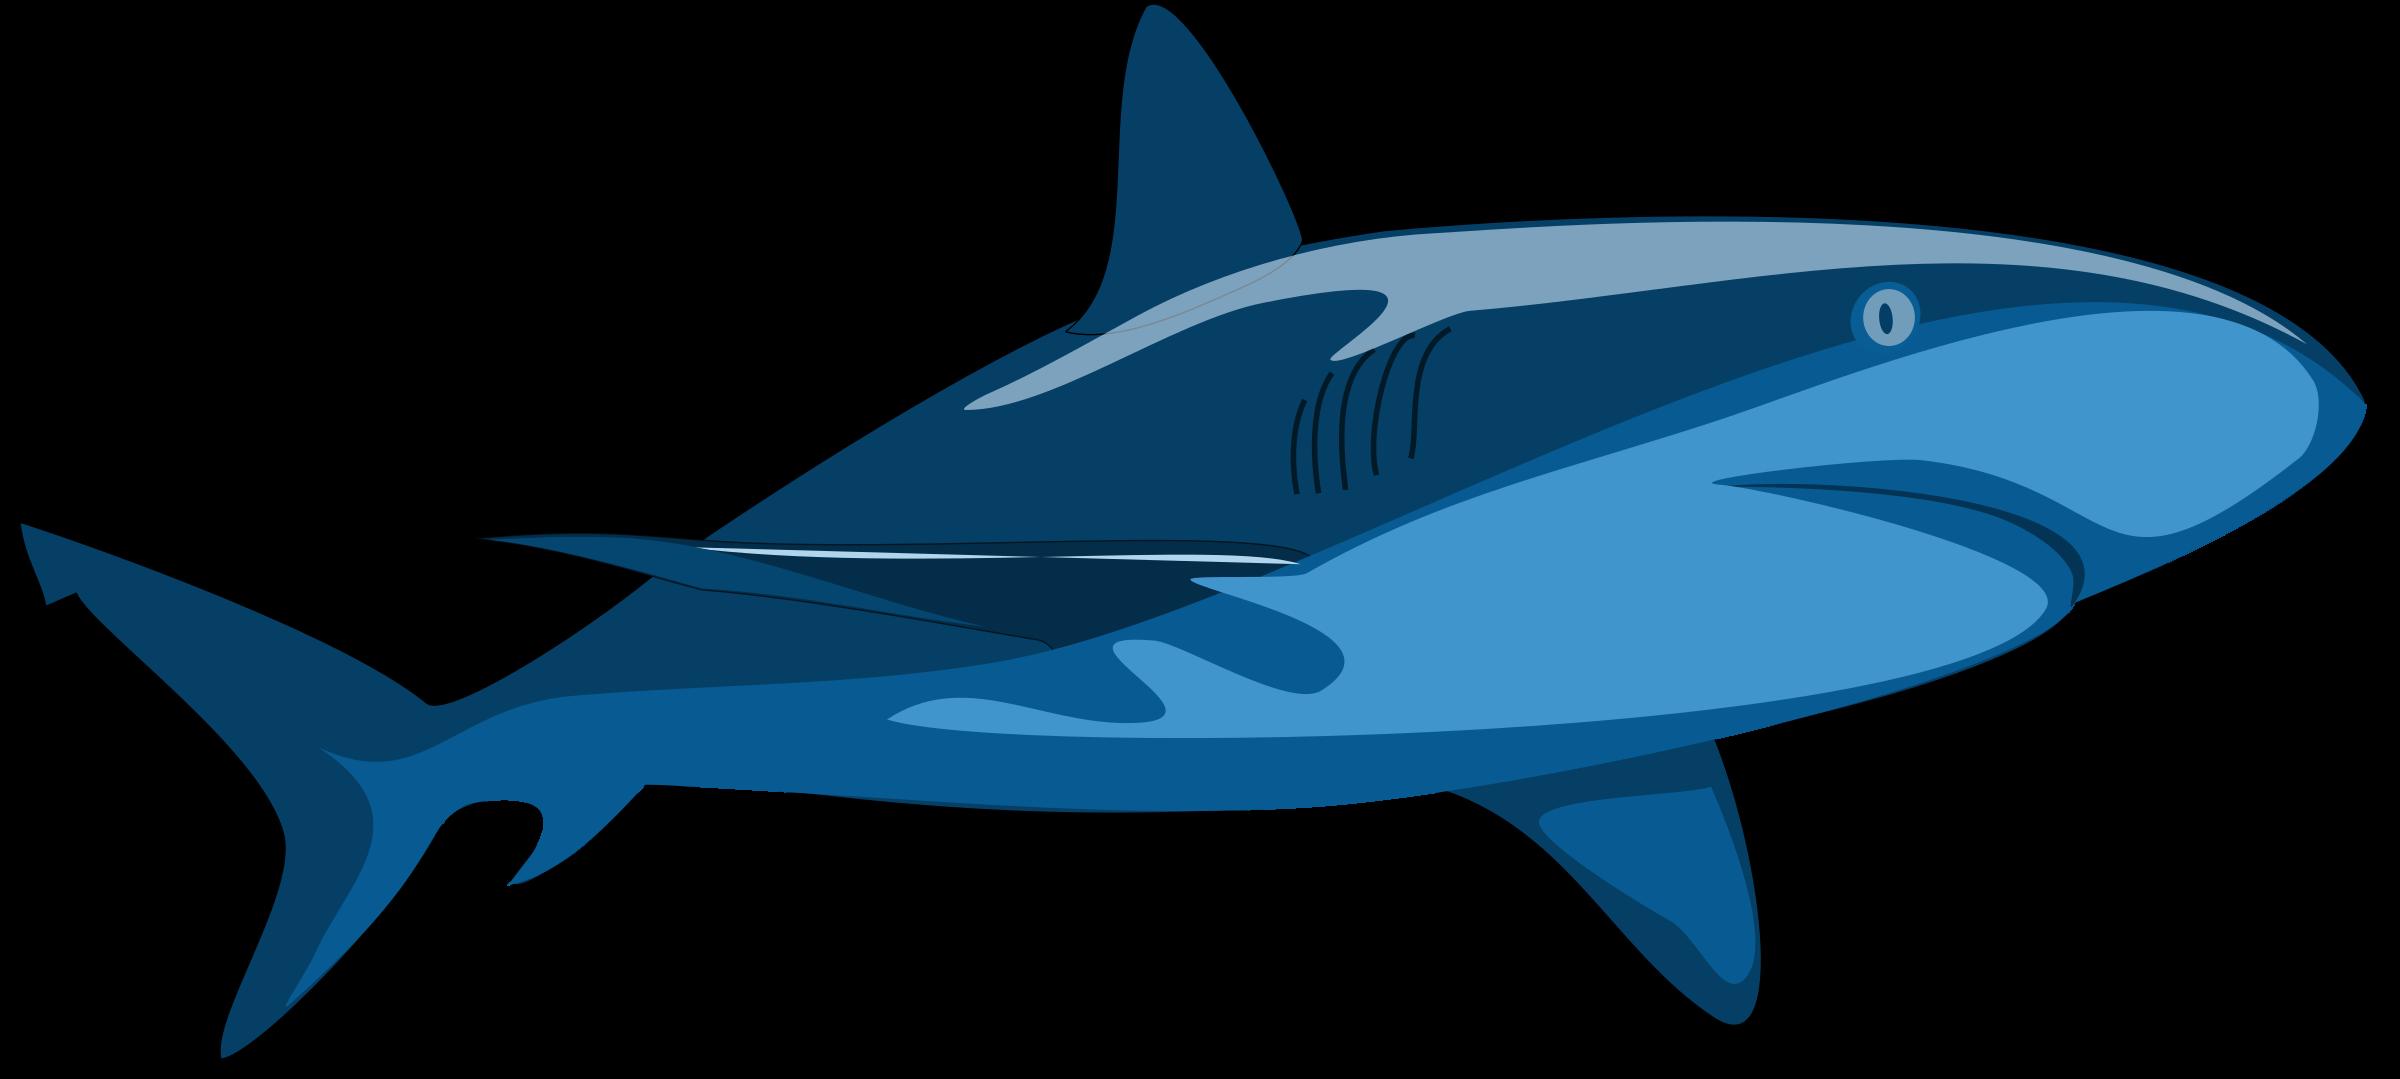 Orange clipart shark. Pure big image png